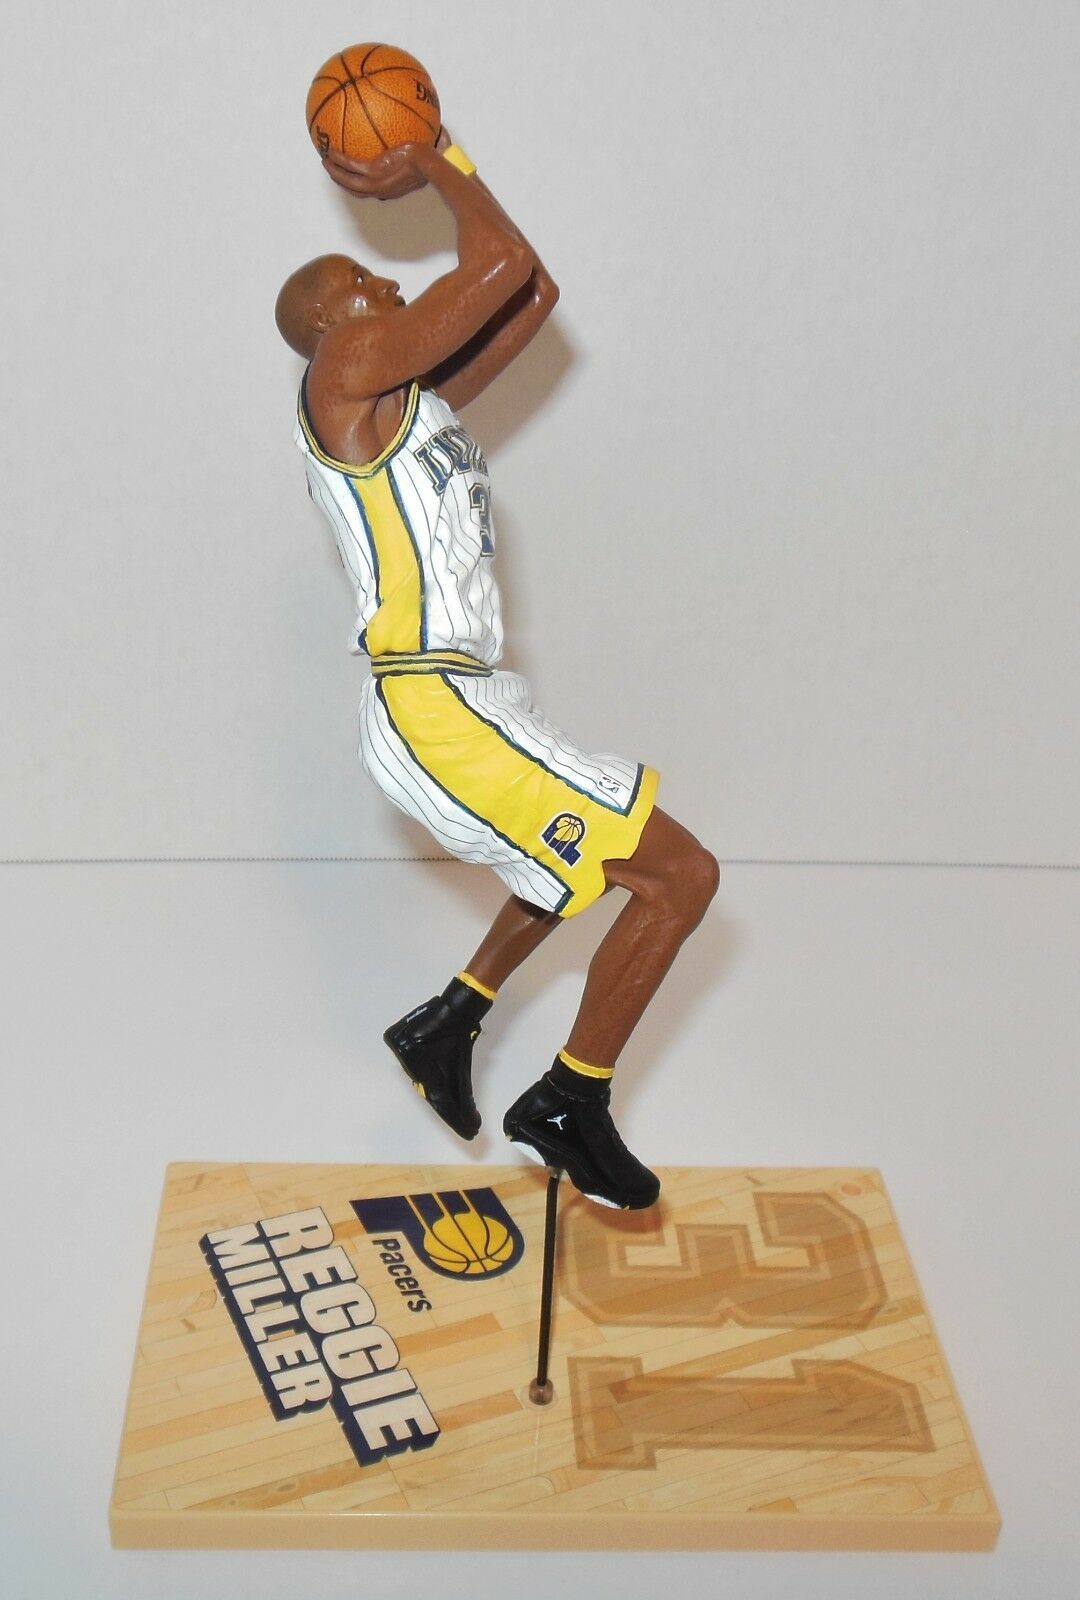 Mcfarlane   Reggie Miller Indiana Indiana Indiana Pacers Basketball - - Loose Figure 590bdb